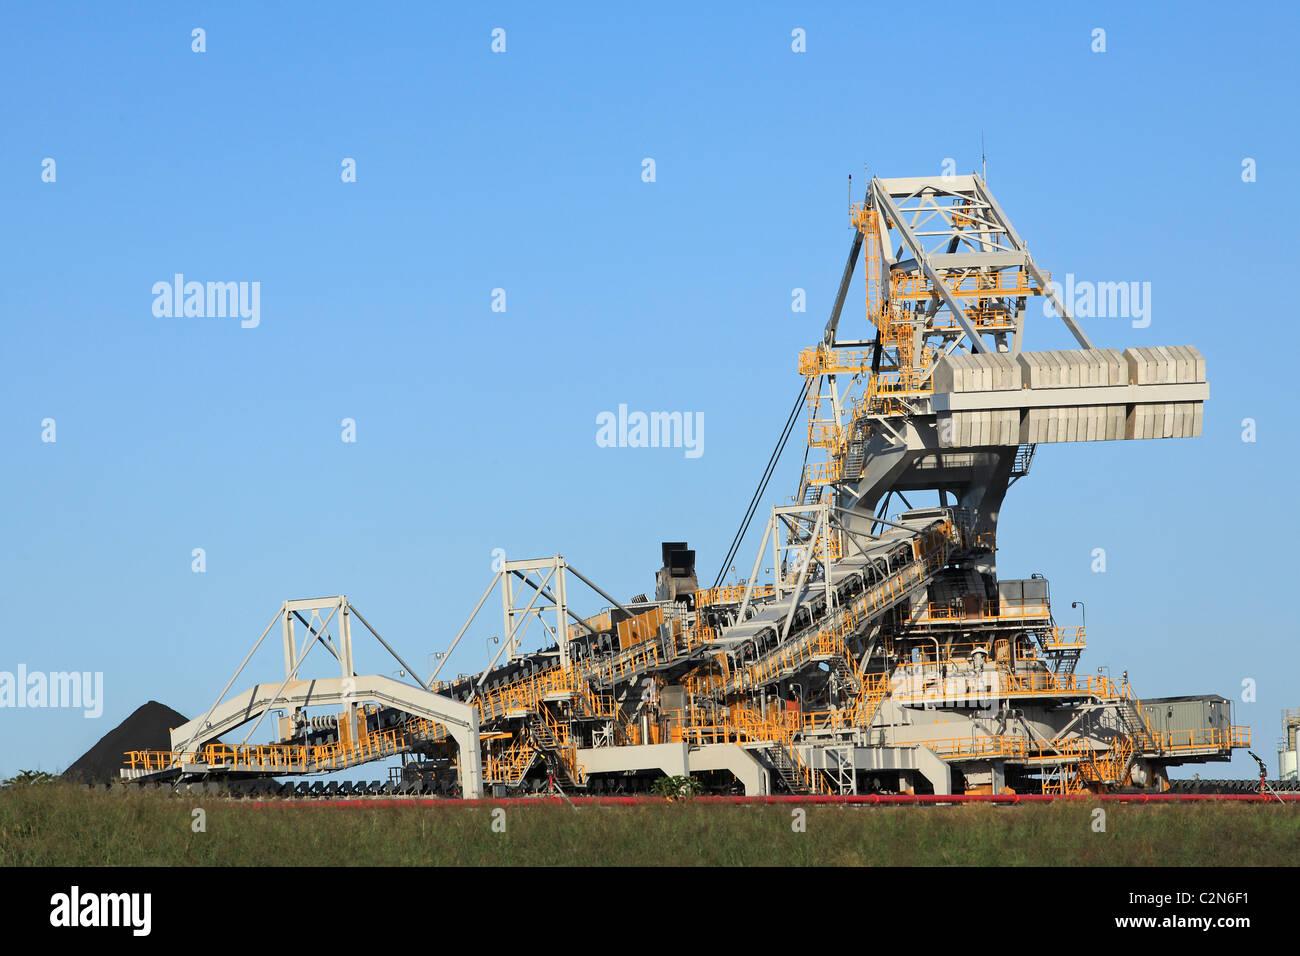 Coal Loading Machinery and Conveyor Belt - Stock Image